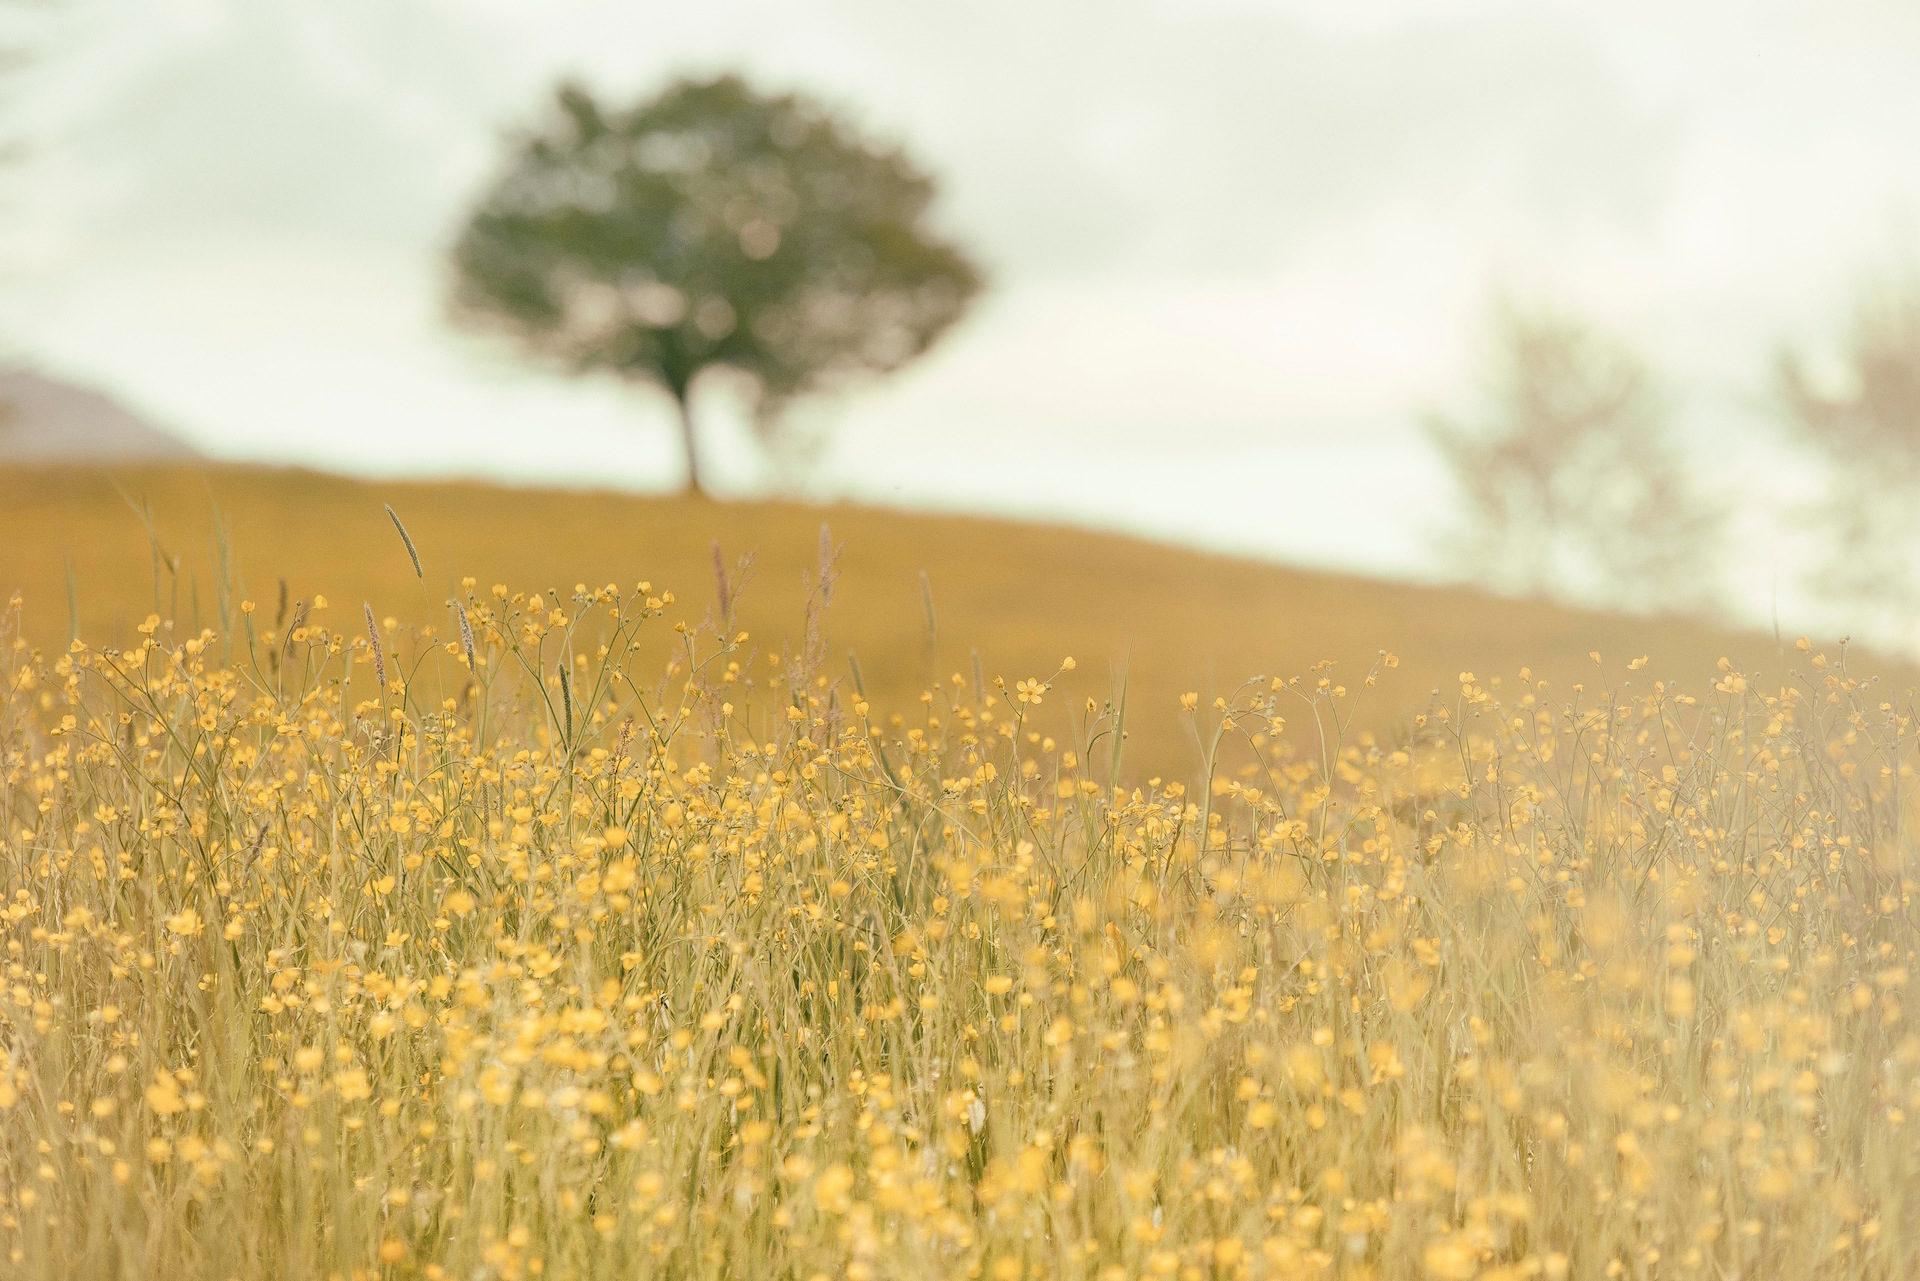 फूल, जंगली, फ़ील्ड, पेड़, Pradera - HD वॉलपेपर - प्रोफेसर-falken.com